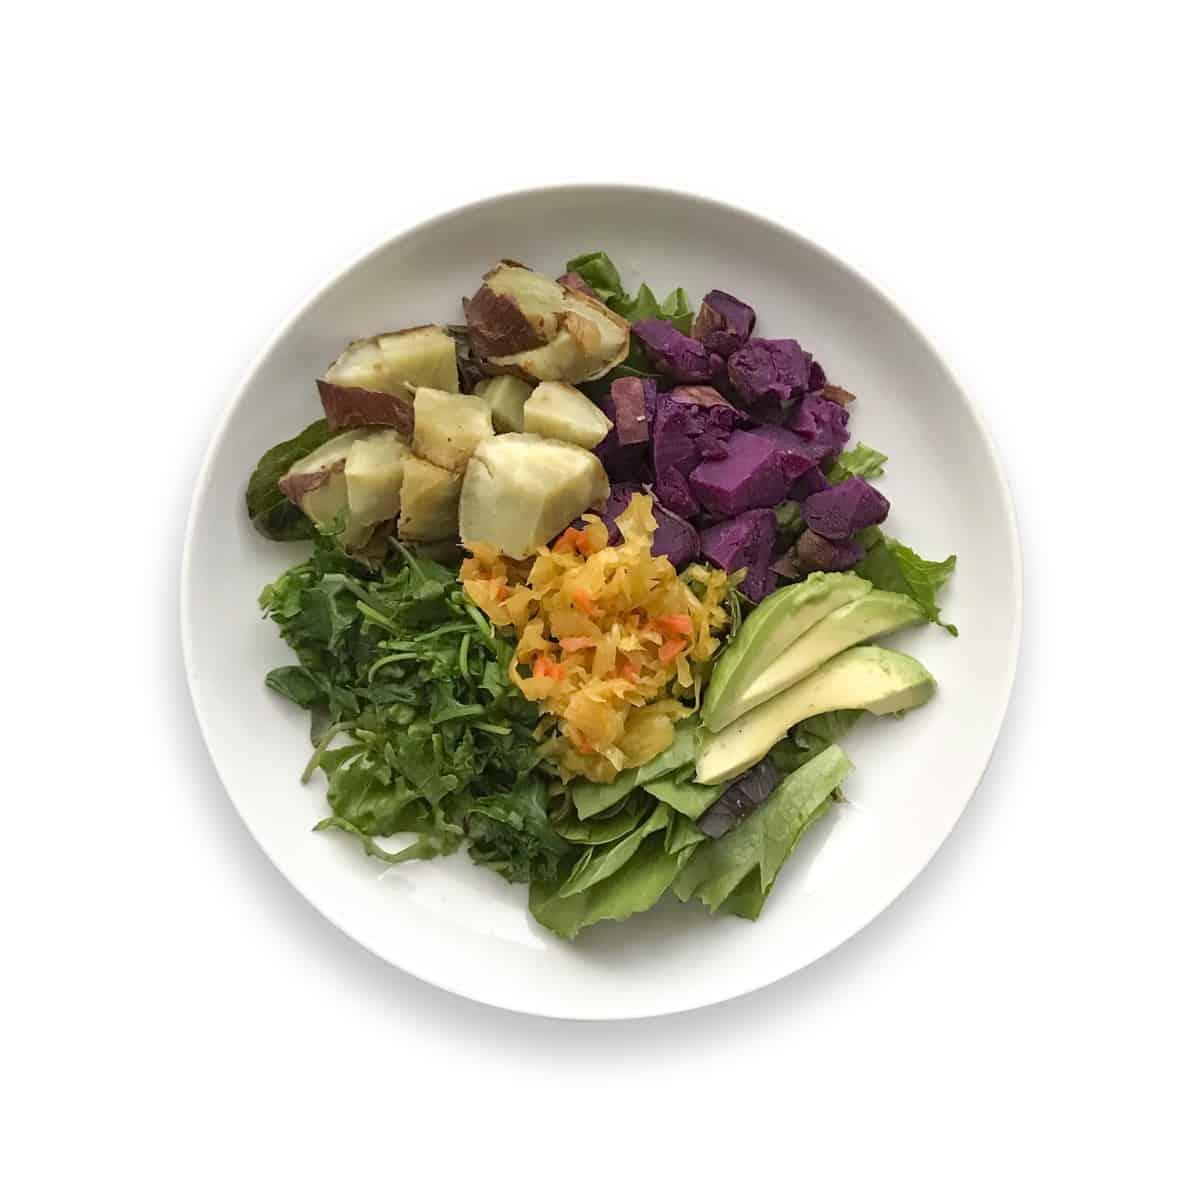 rainbow wellness breakfast bowl - Chef Whitney Aronoff | Starseed Kitchen